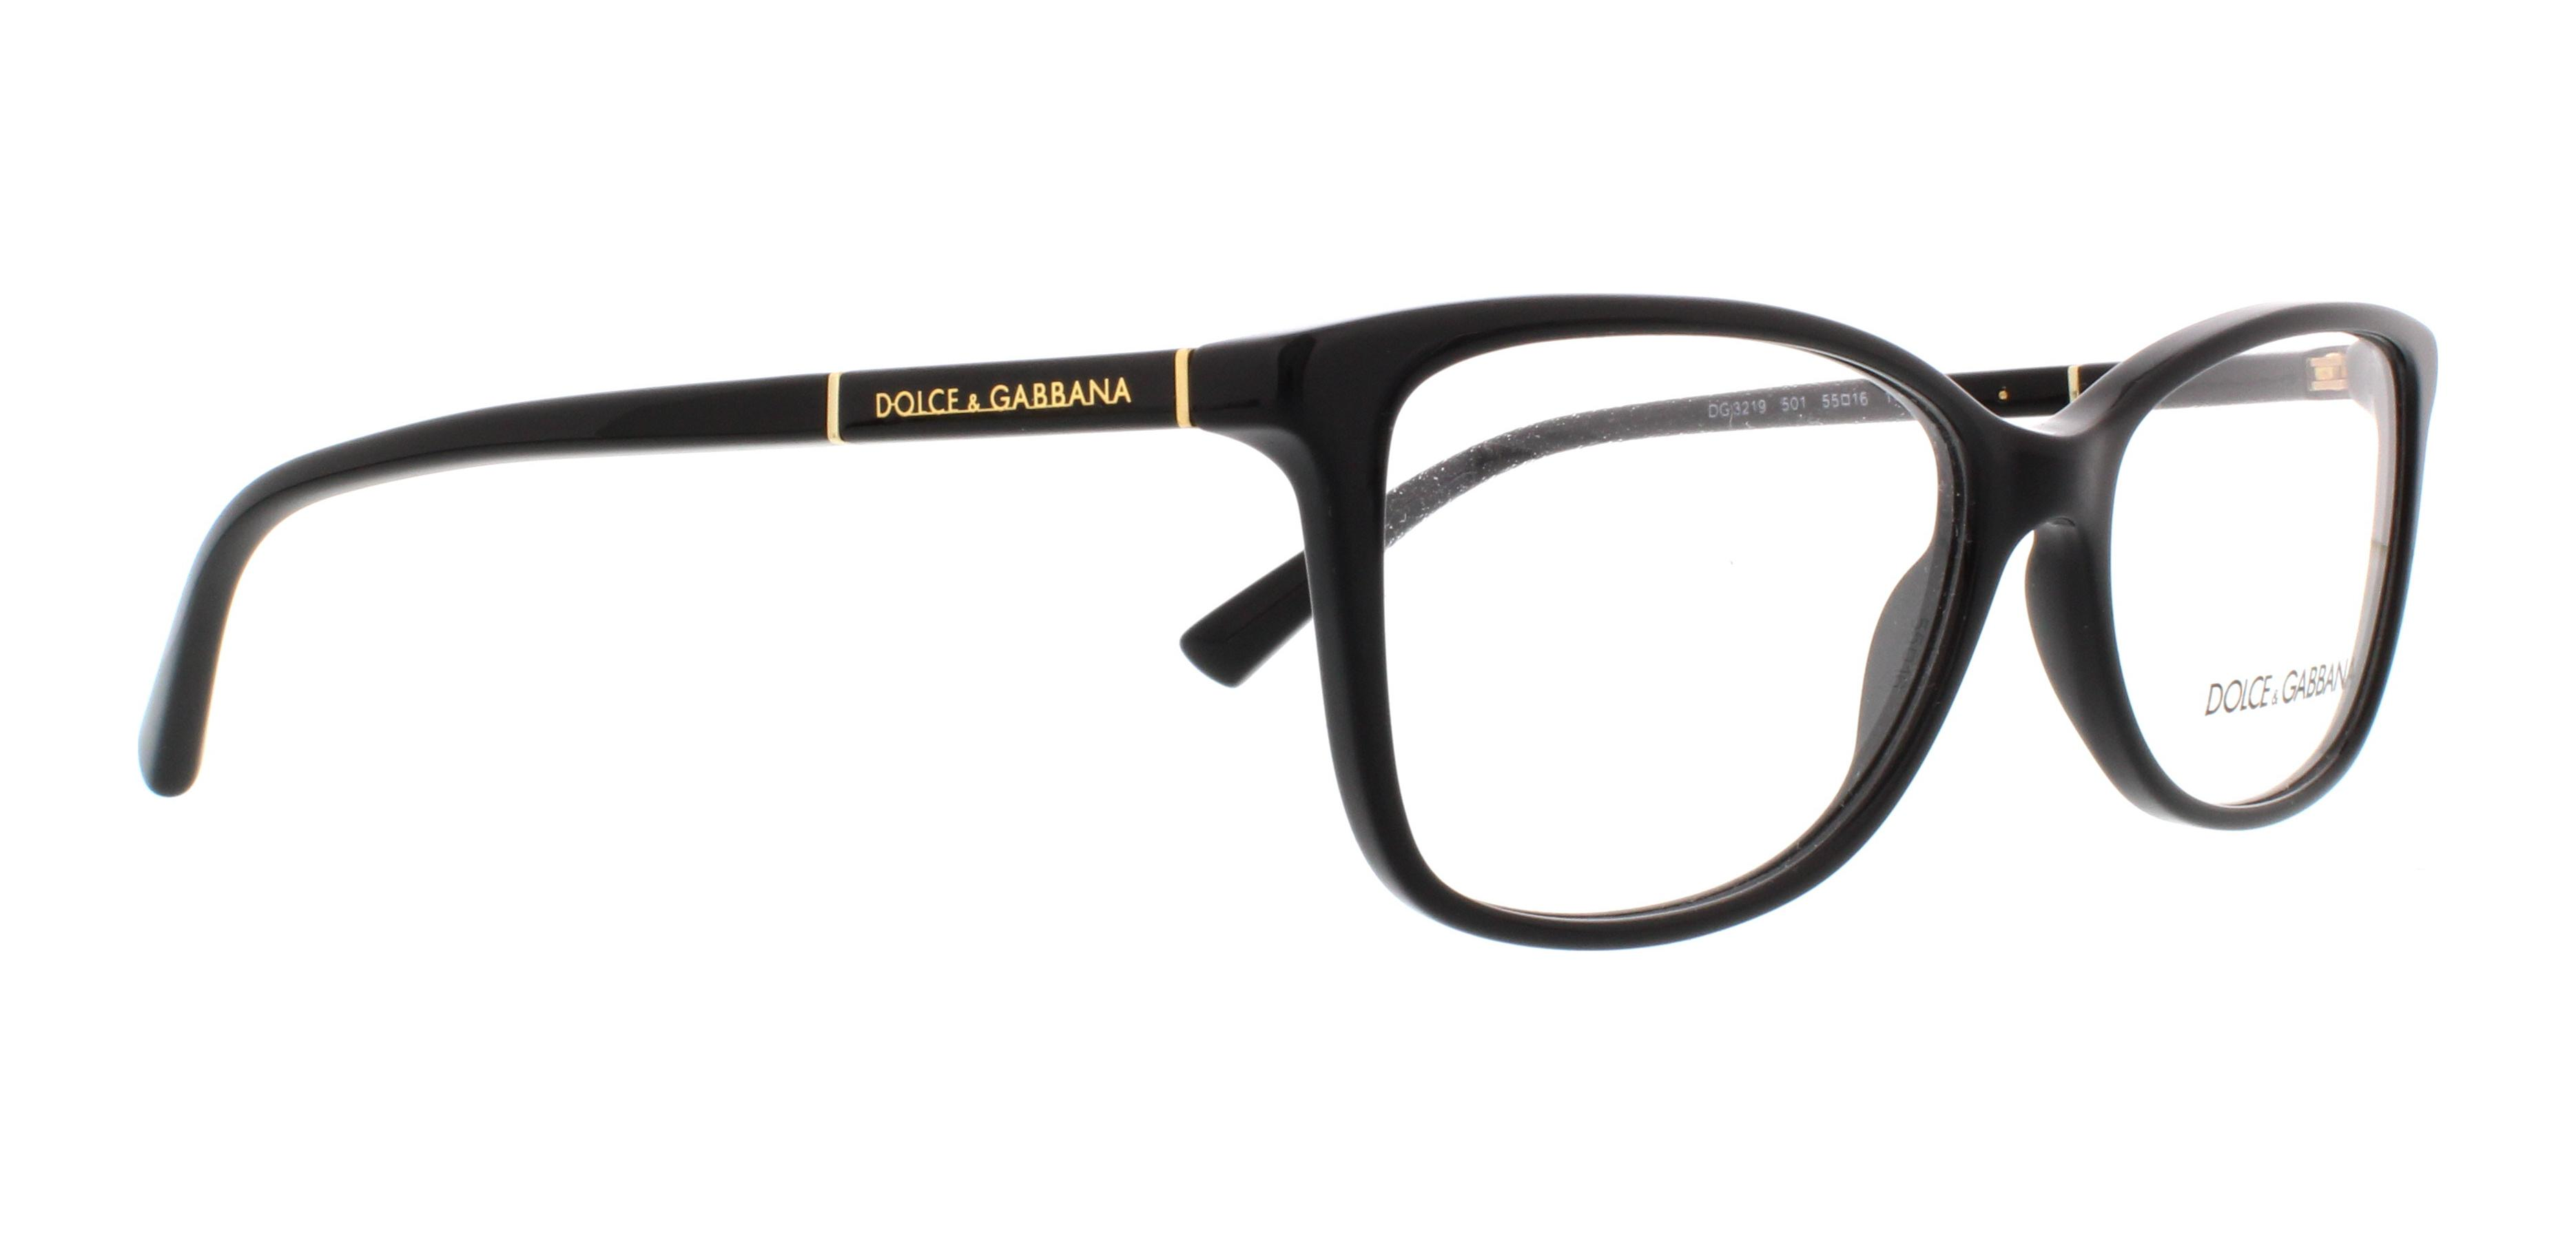 08ce1c50aa23 DOLCE   GABBANA Eyeglasses DG 3219 501 Black 55MM - Walmart.com